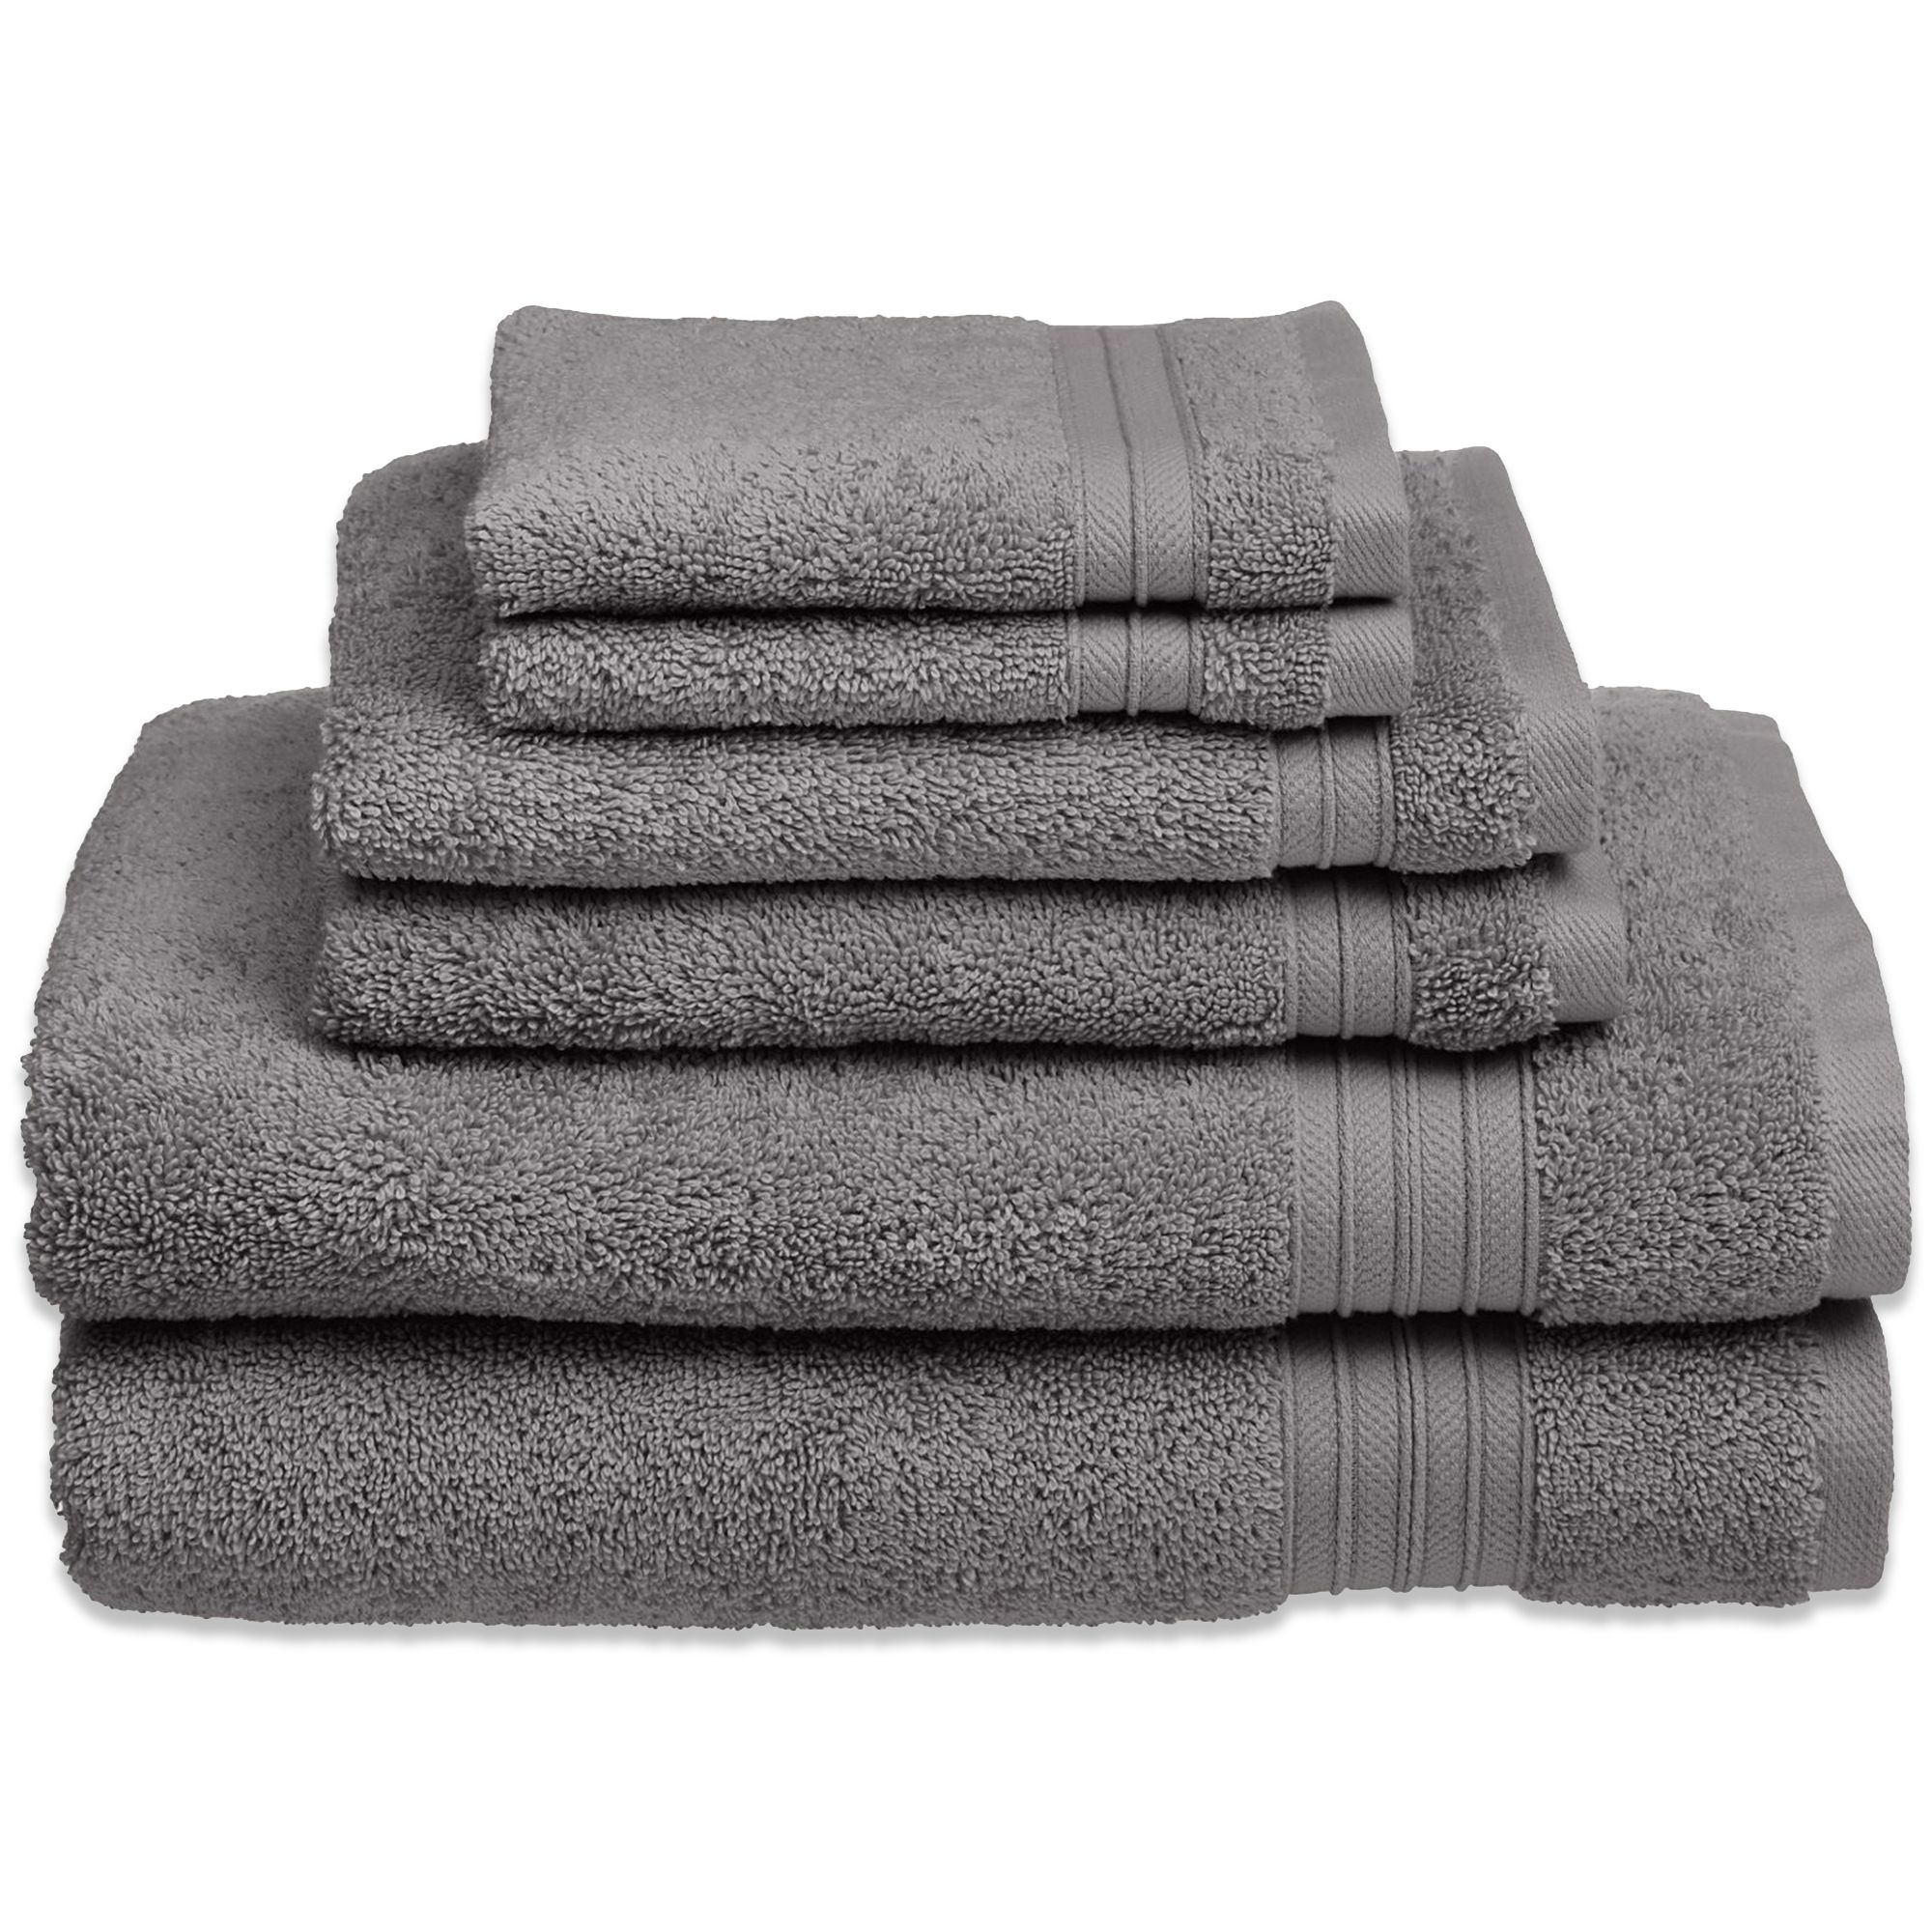 bath towels | beach towels | white towels - bed bath & beyond